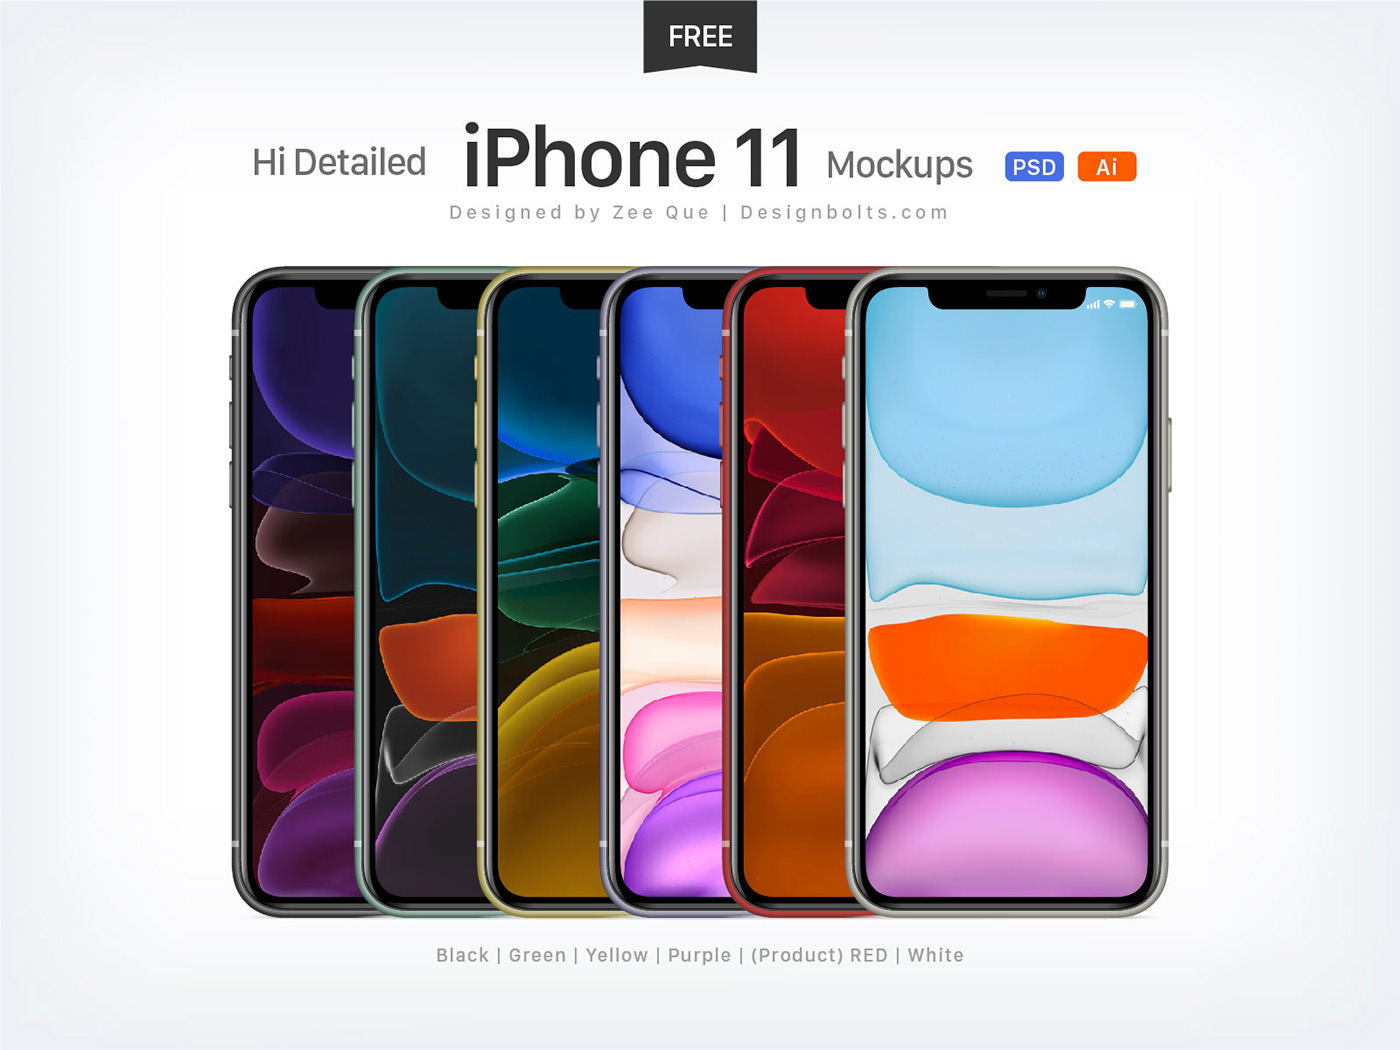 Free Apple iPhone 21 Mockup PSD & Ai on Behance